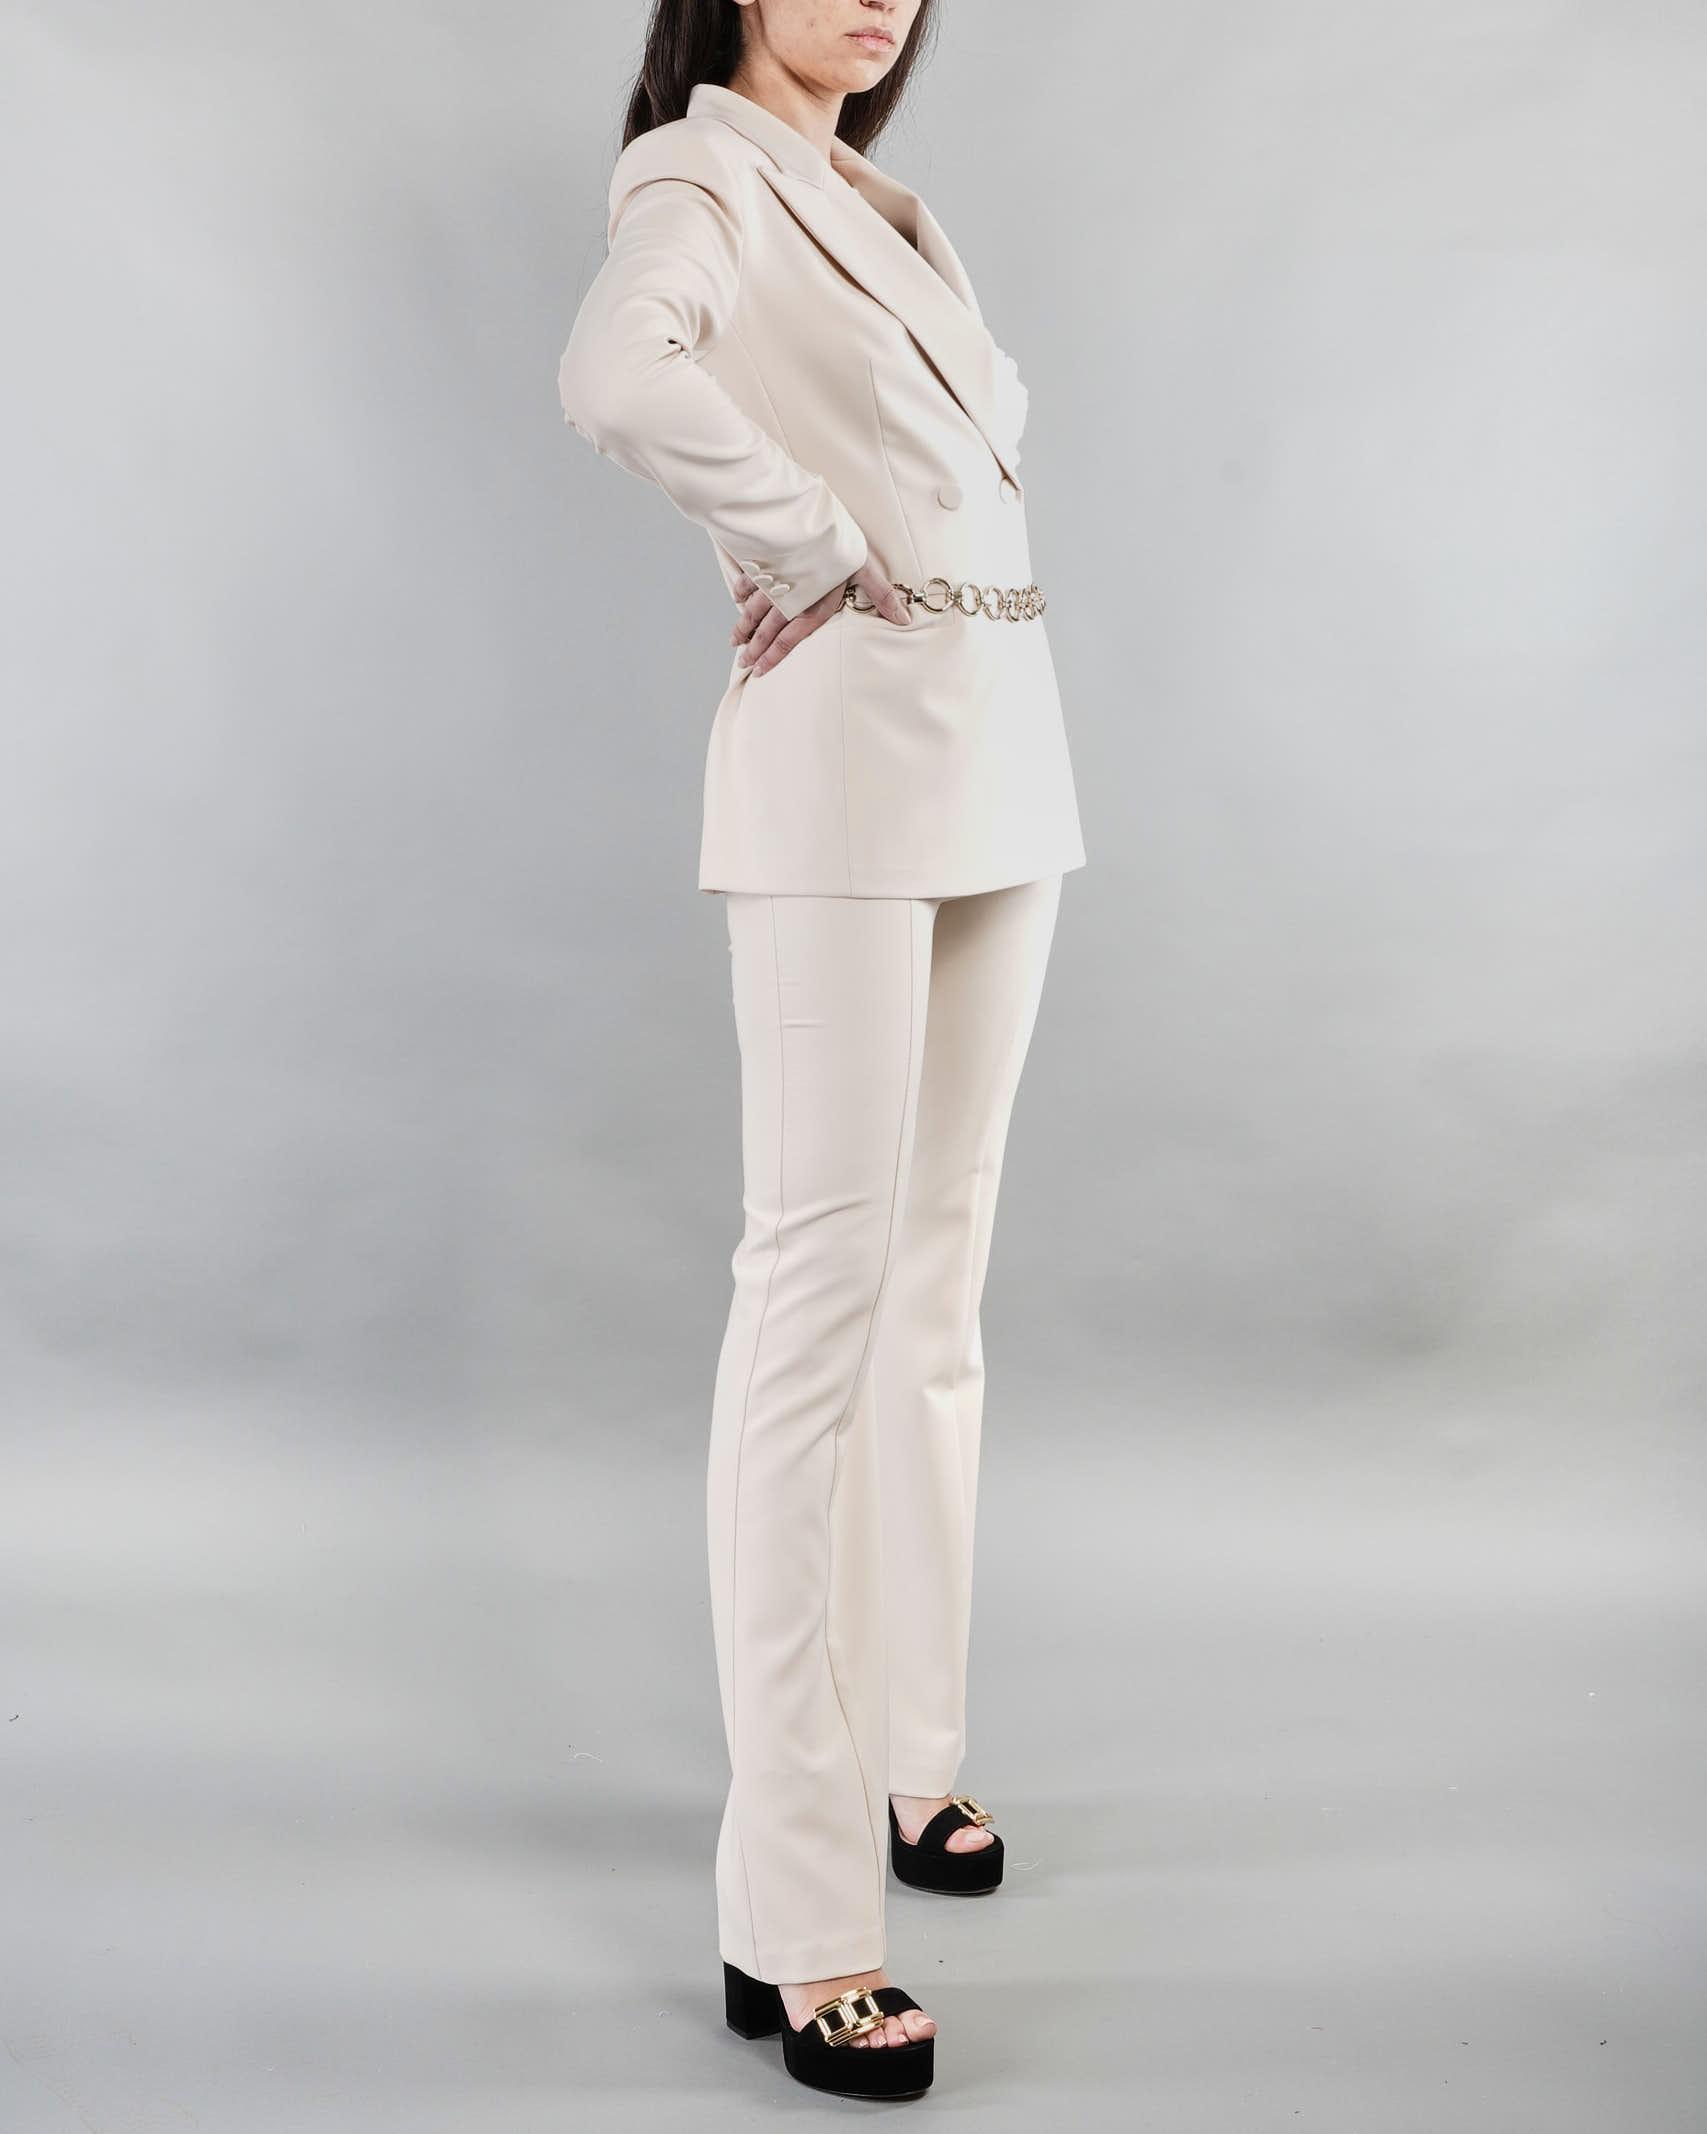 Giacca doppiopetto con revers a lancia e cintura Imperial IMPERIAL | Giacca | JY21BEXCREMA